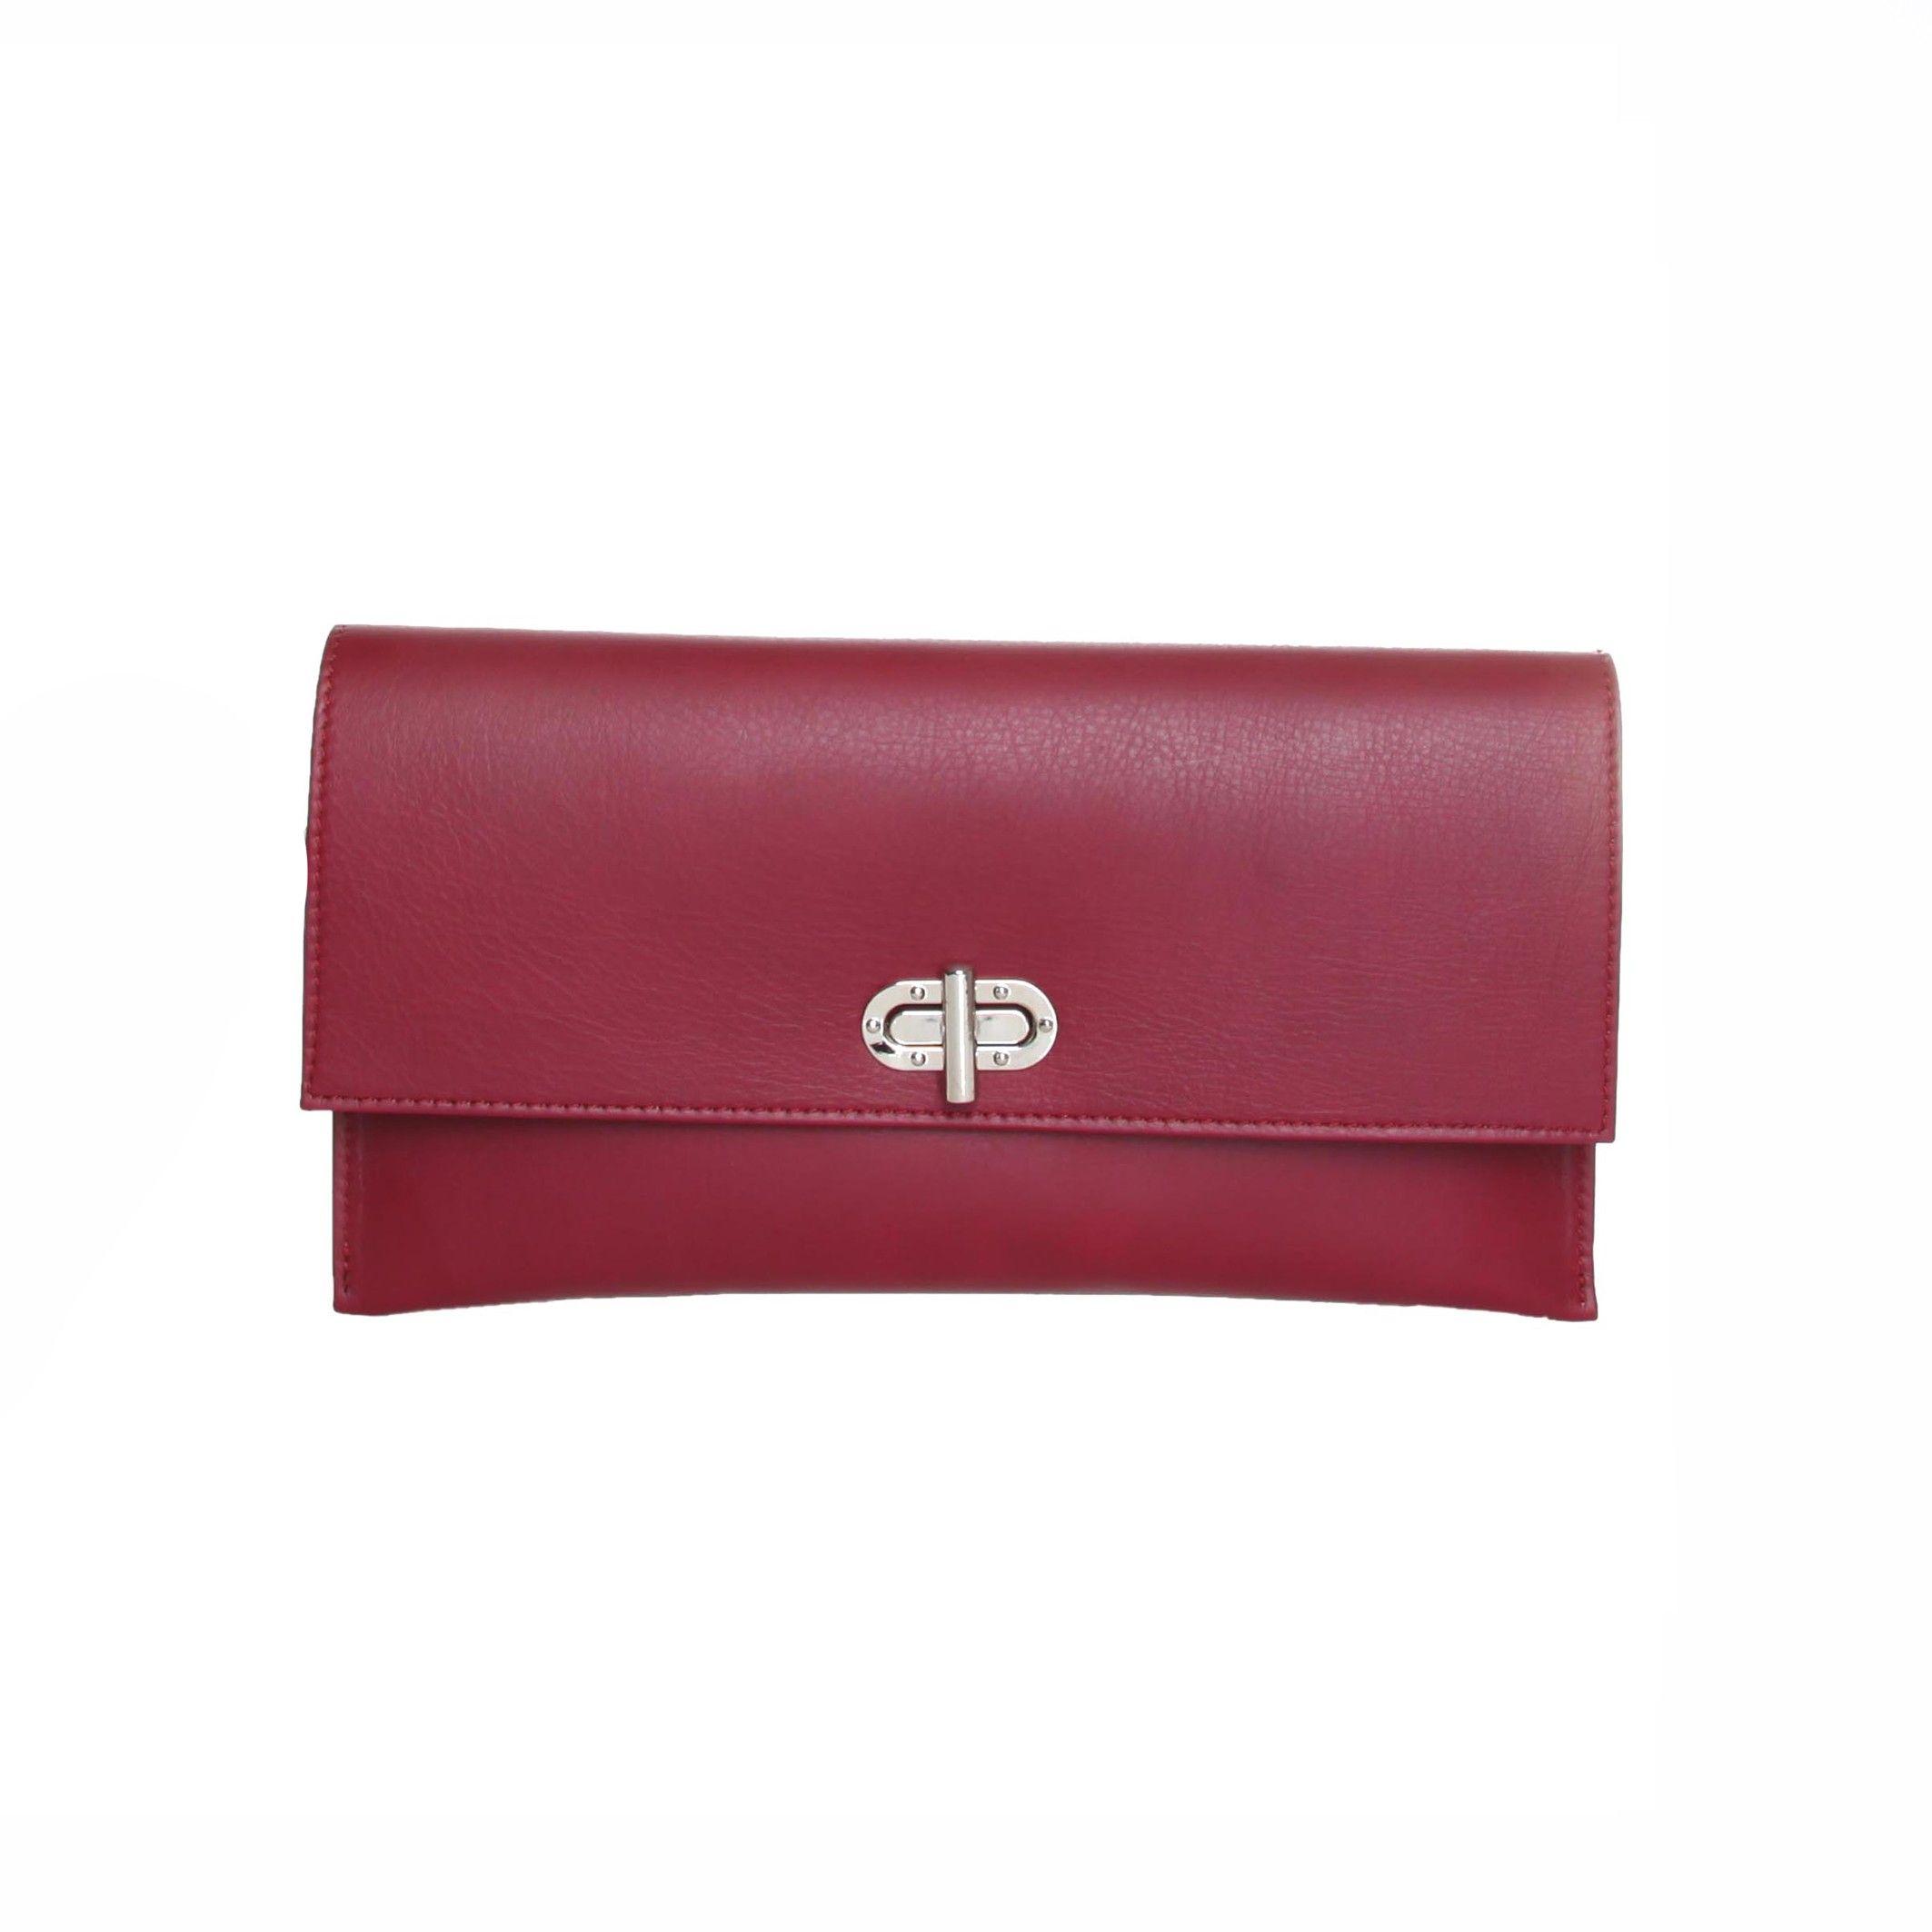 Geanta Dama Made In Italia Posillipo Bordo Continental Wallet Wallet Bags